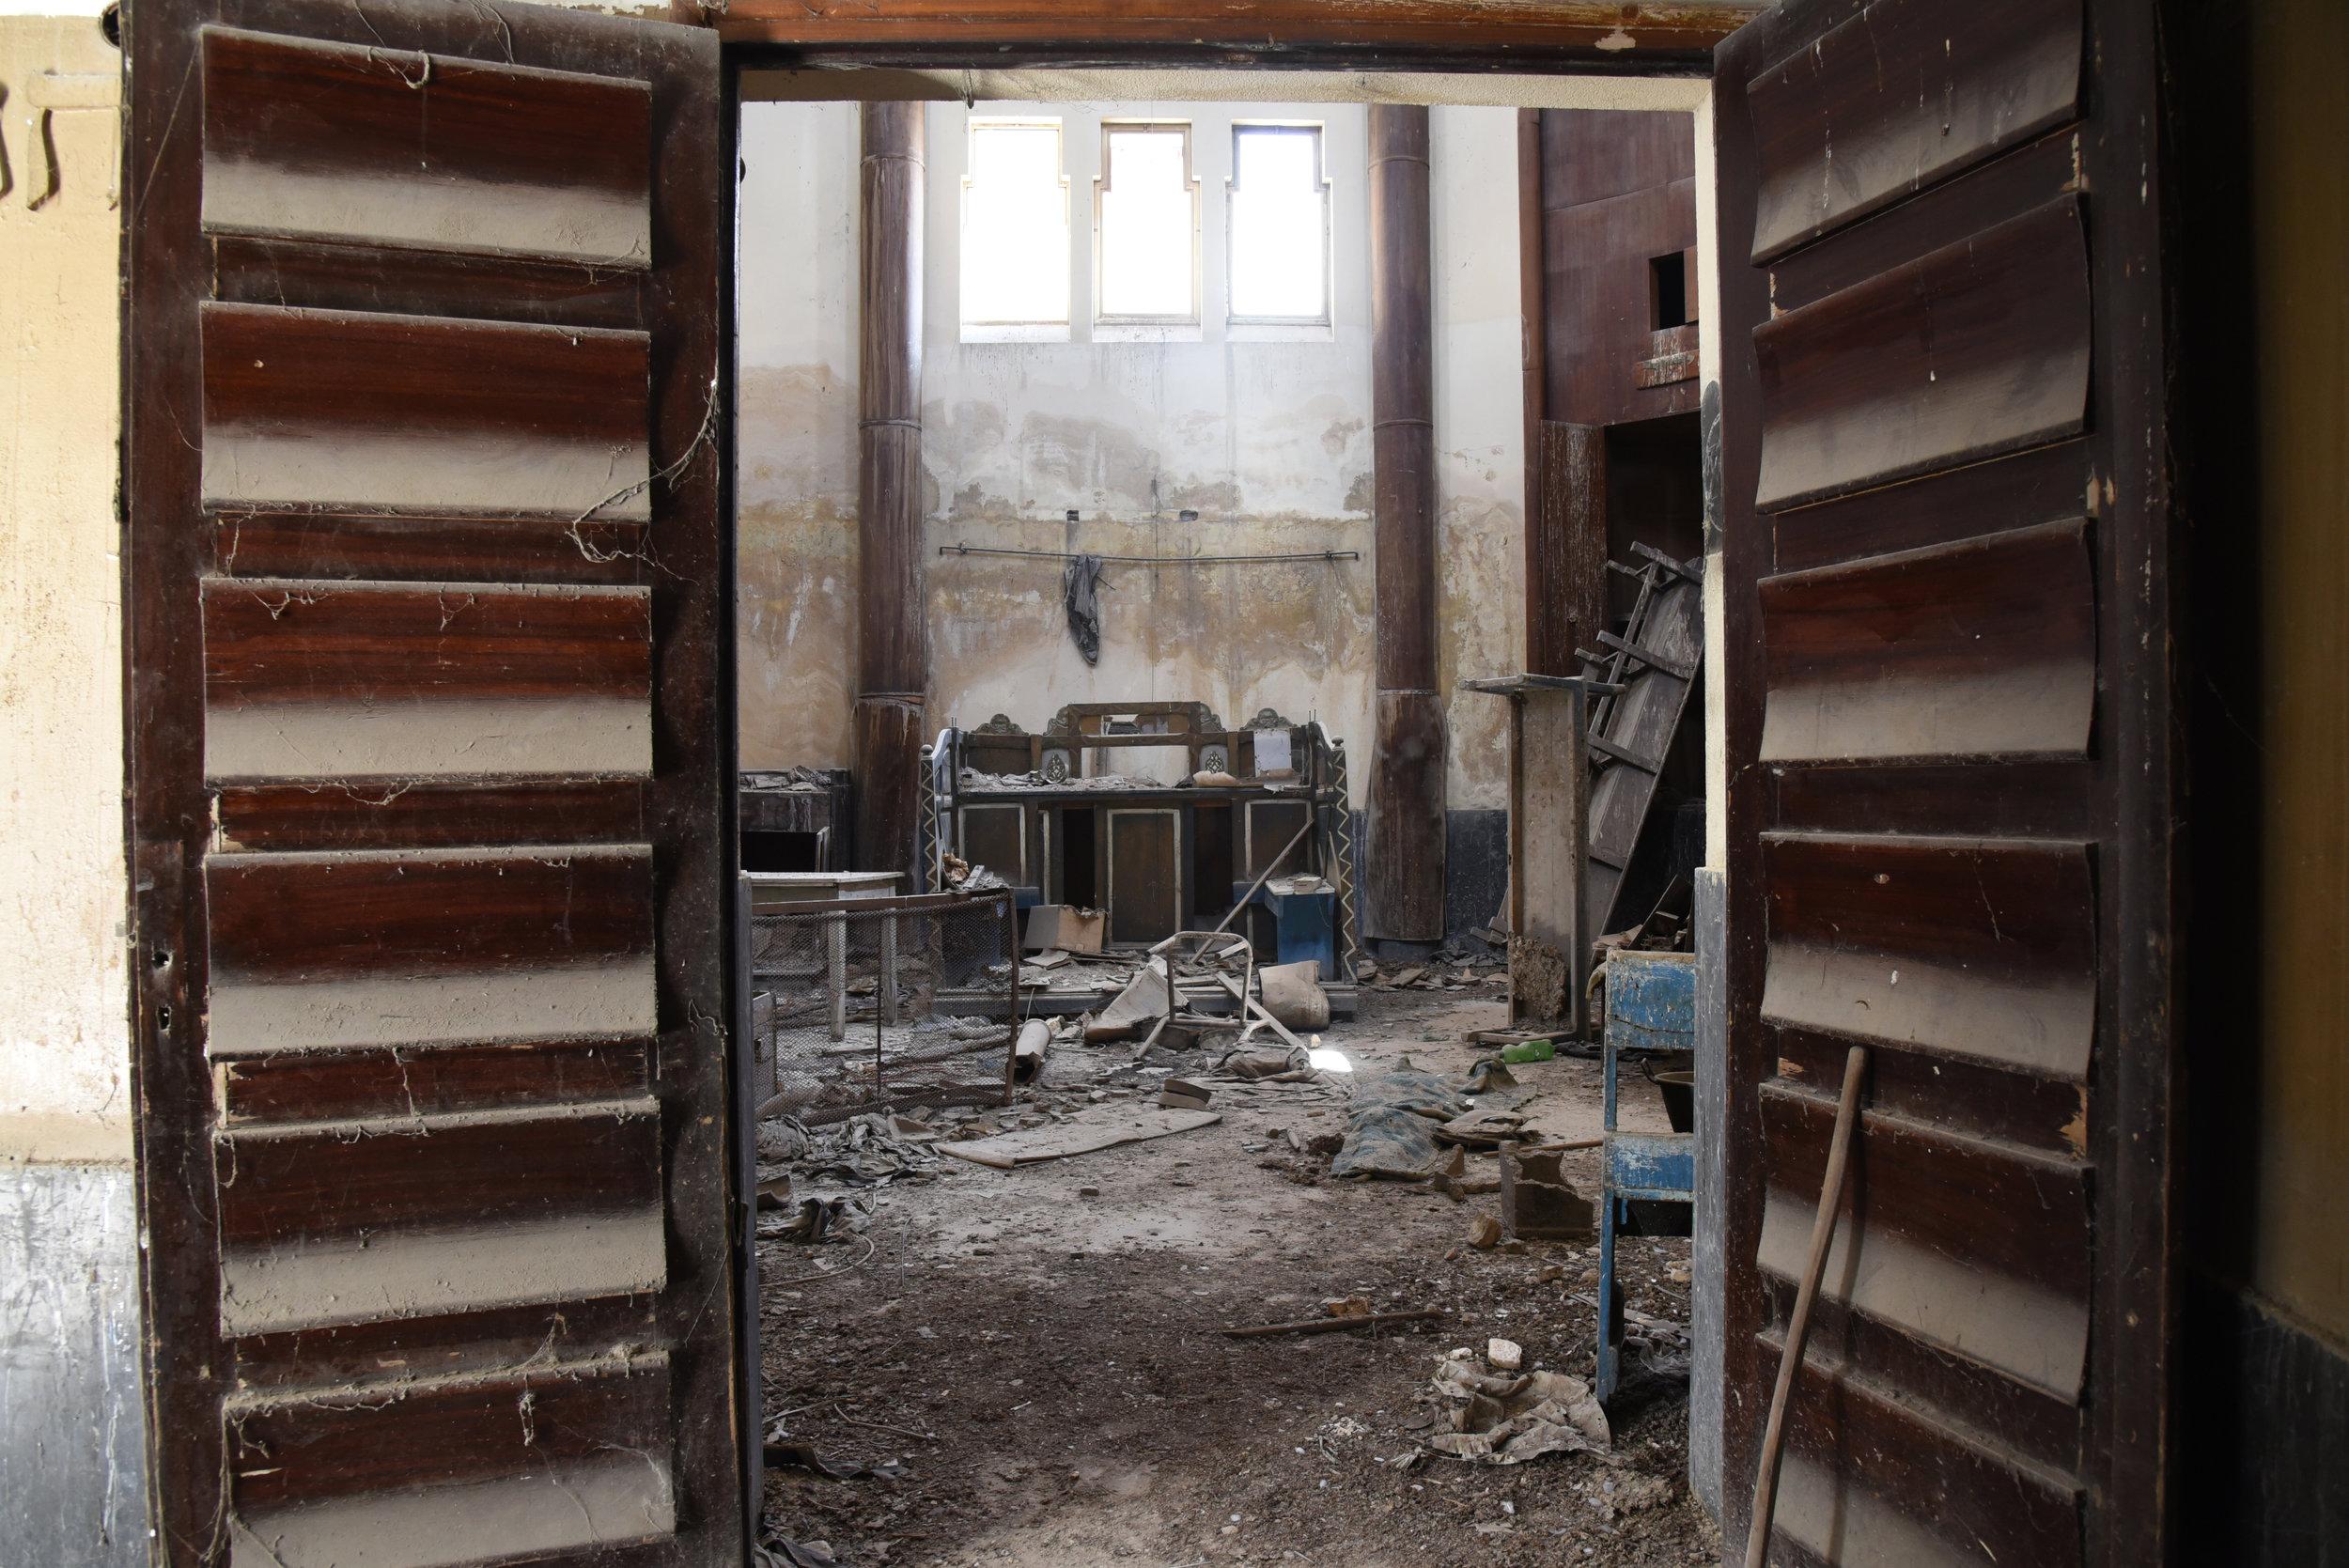 Hafsia synagogue interior. Tunis, Tunisia